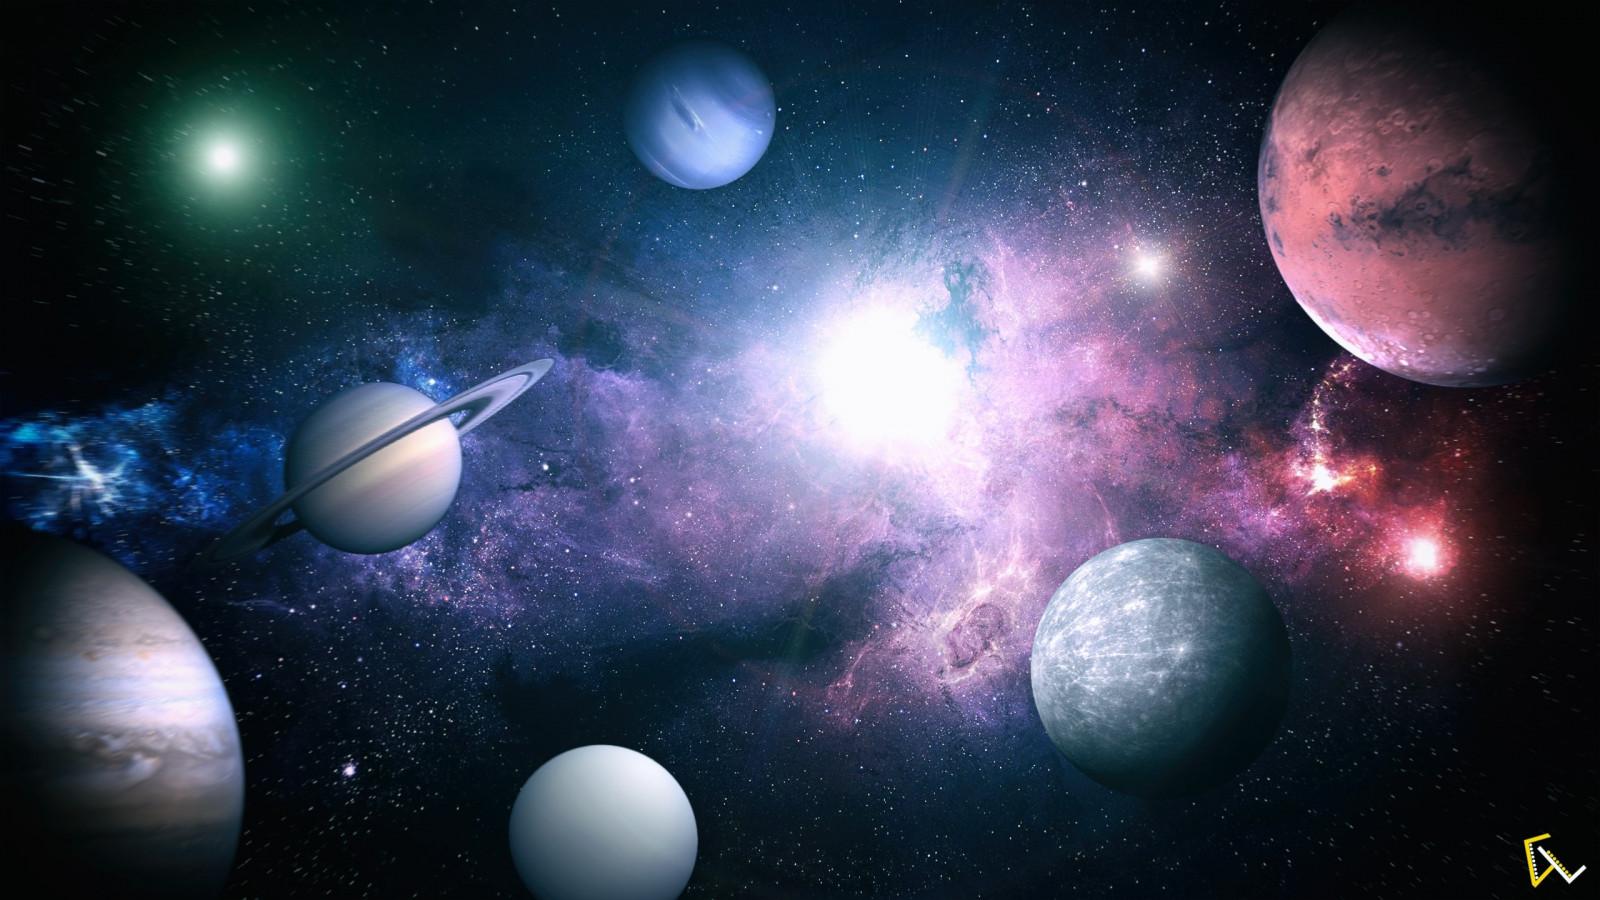 Download Wallpaper 2780x2780 Planet Galaxy Universe: Wallpaper : Lights, Photoshop, Galaxy, Planet, Atmosphere